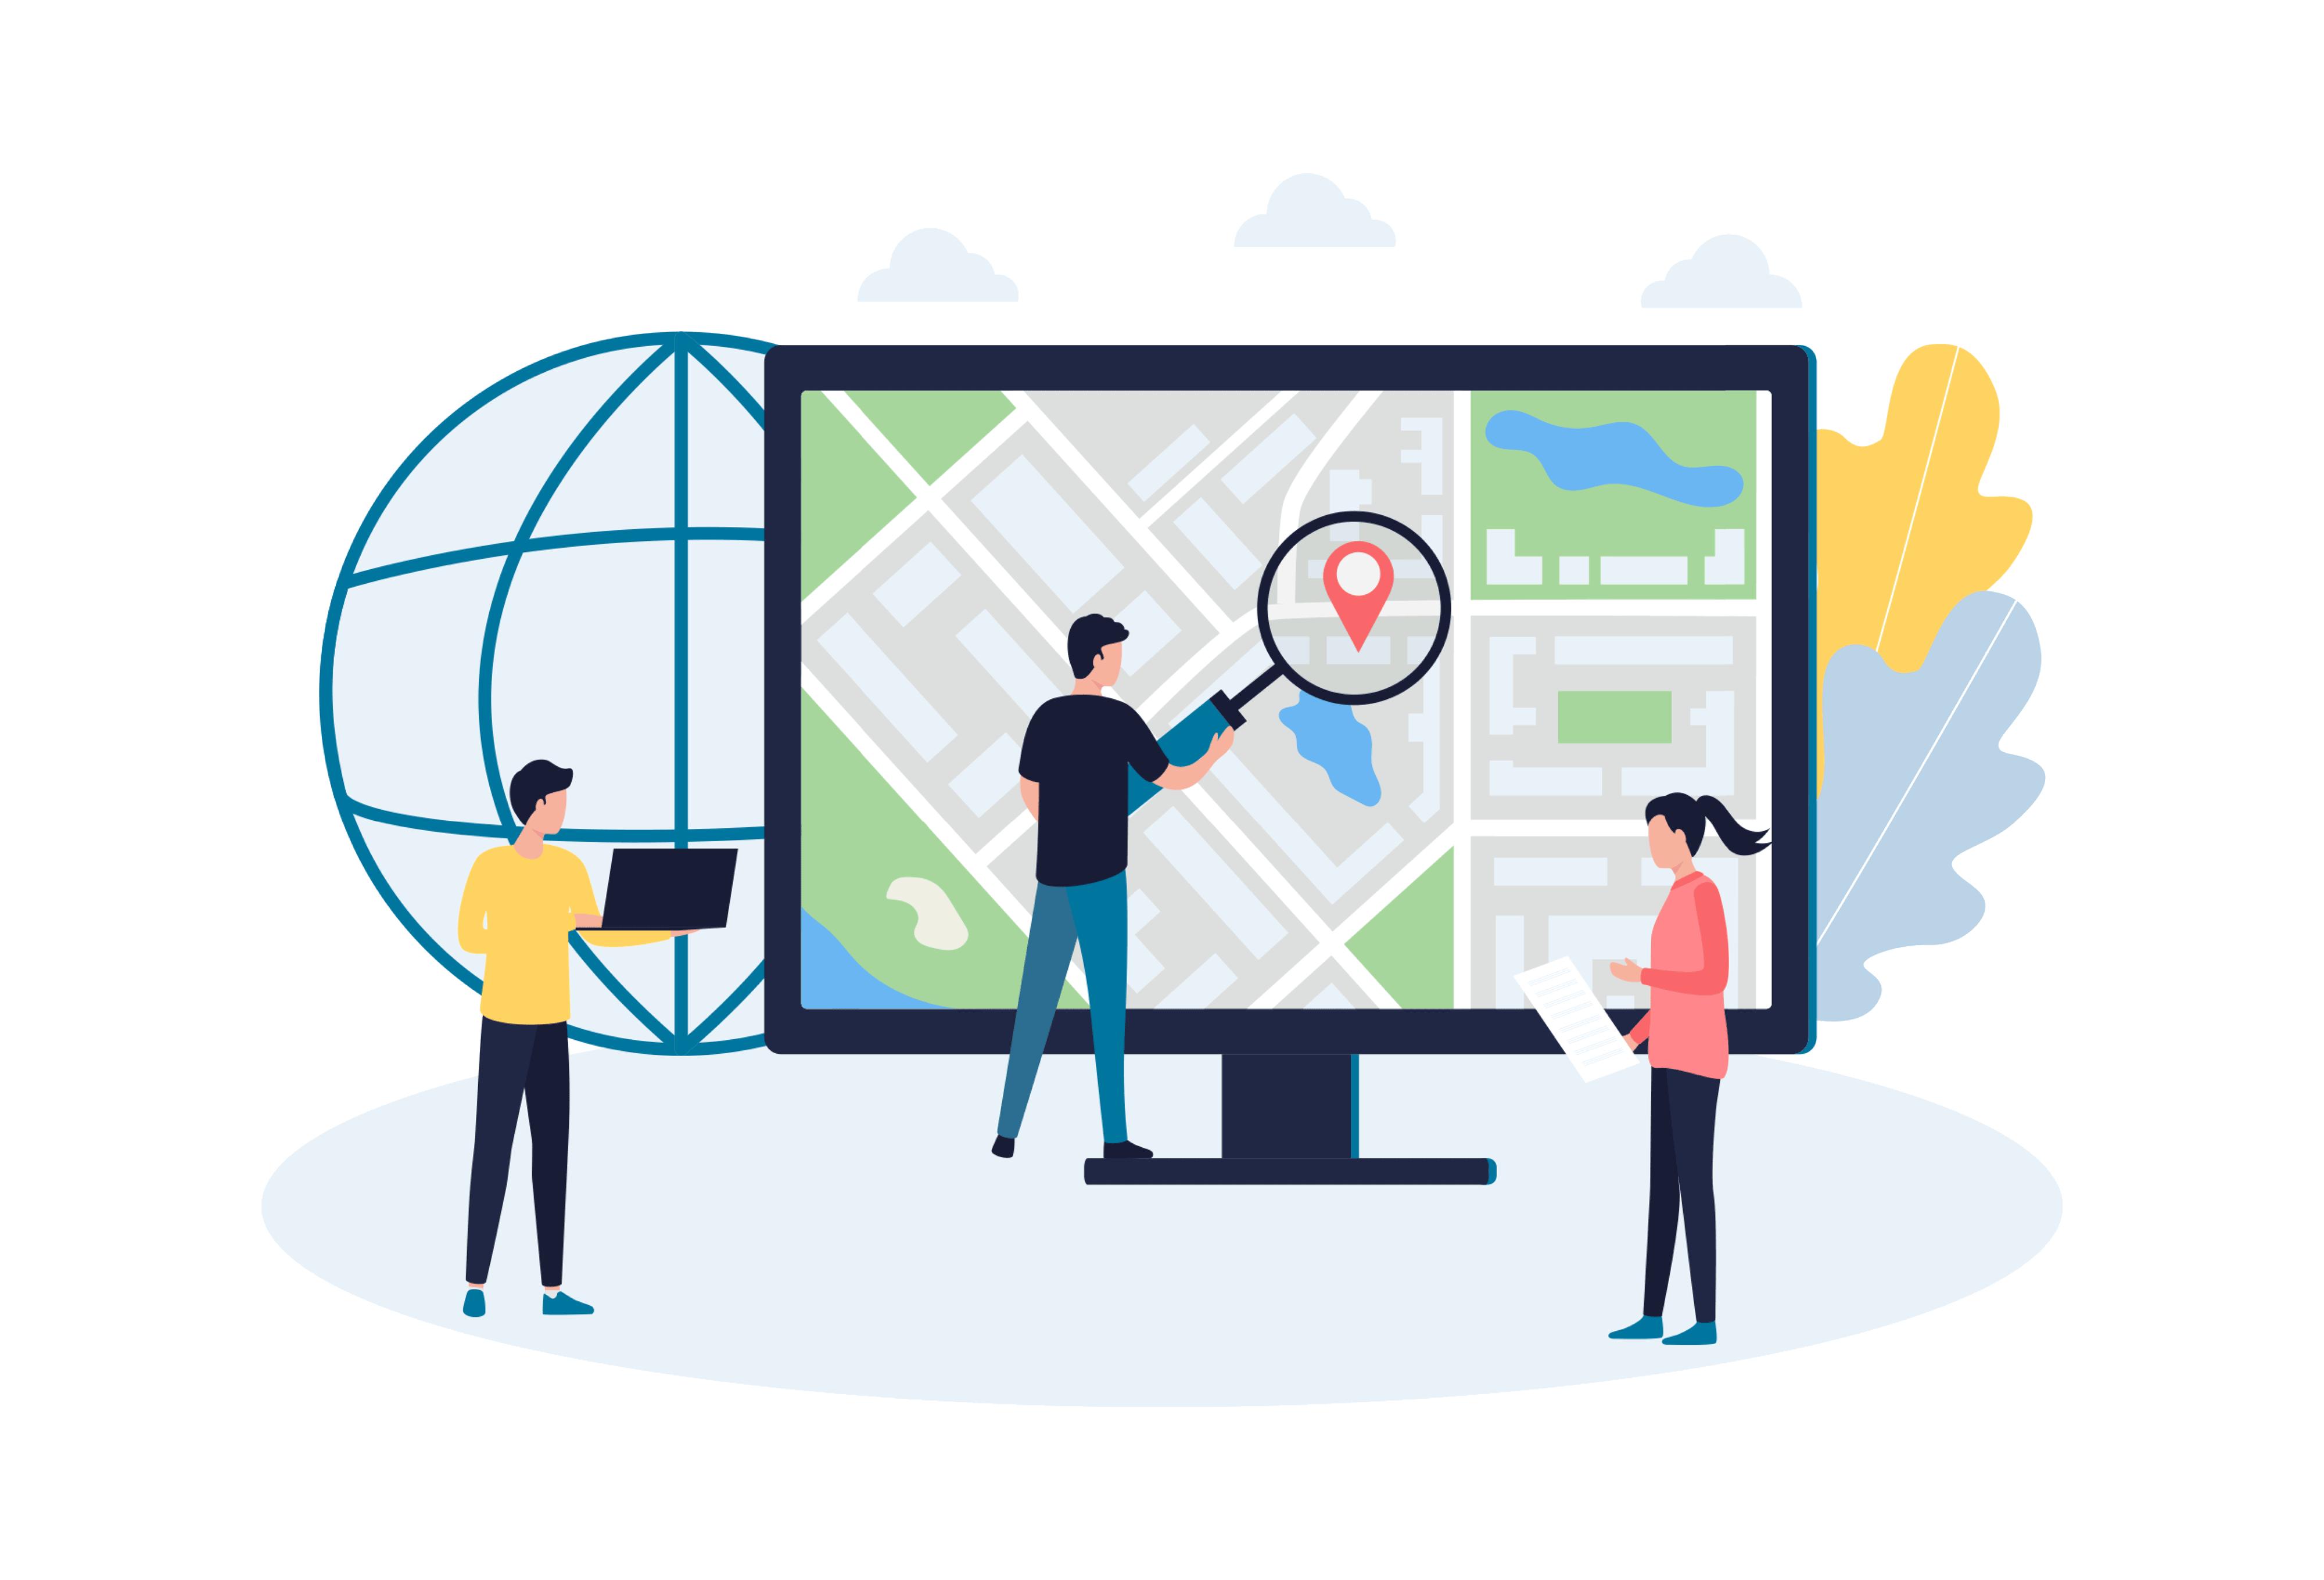 local search engine optimization (SEO)